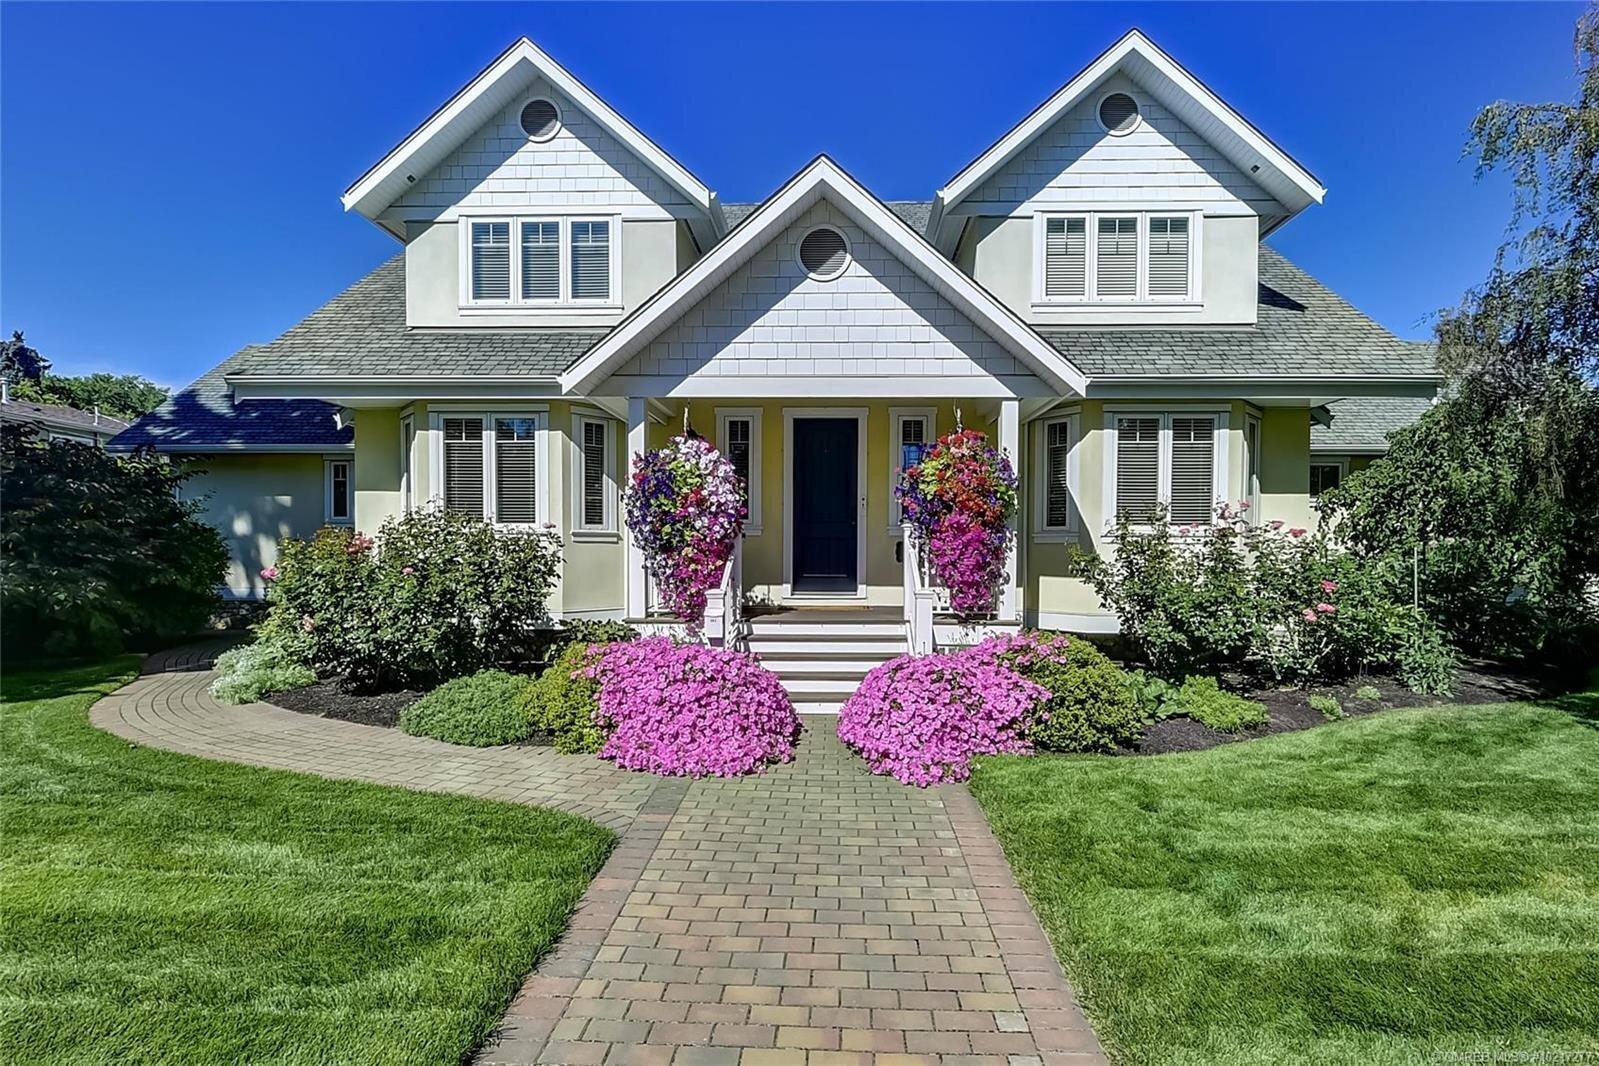 House for sale at 548 Francis Ave Kelowna British Columbia - MLS: 10217277